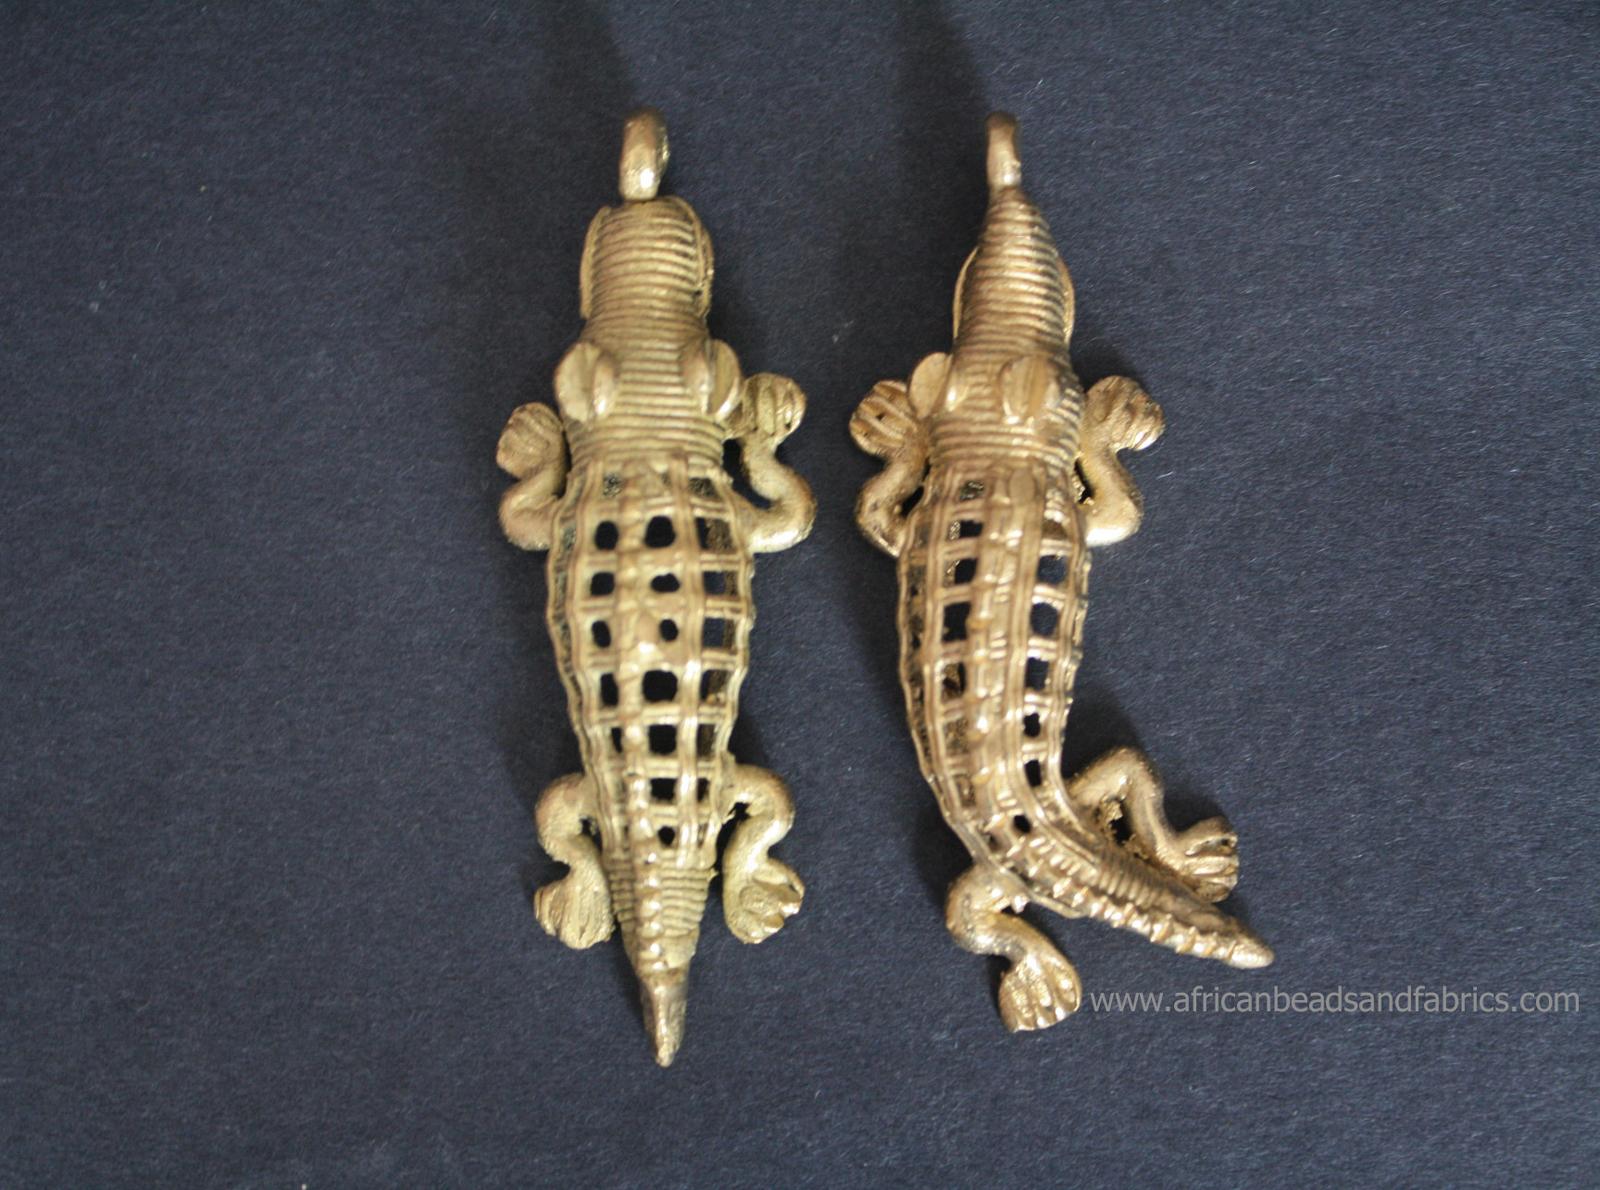 African-Brass-Croc-Pendant-Mesh-Design-watermarked